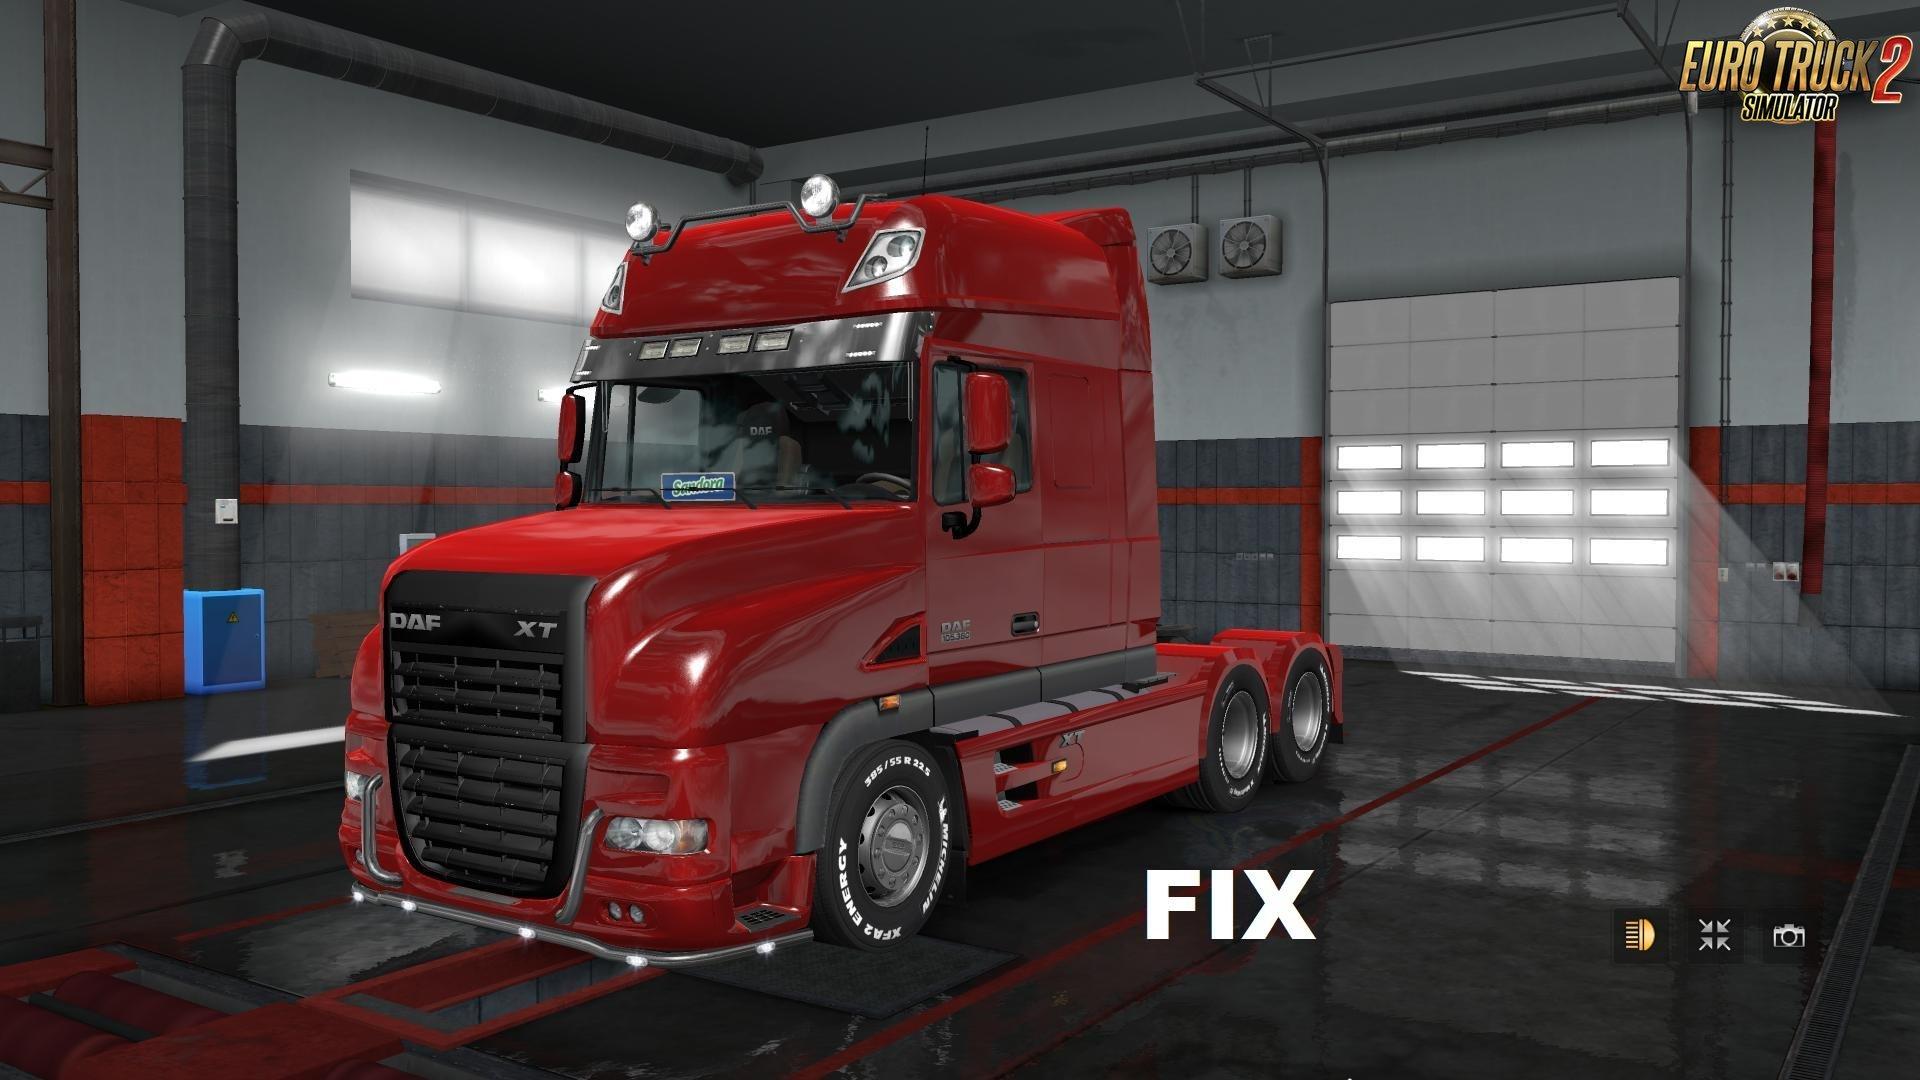 Fix for Truck DAF XT Rework v1.0 [1.31.x]